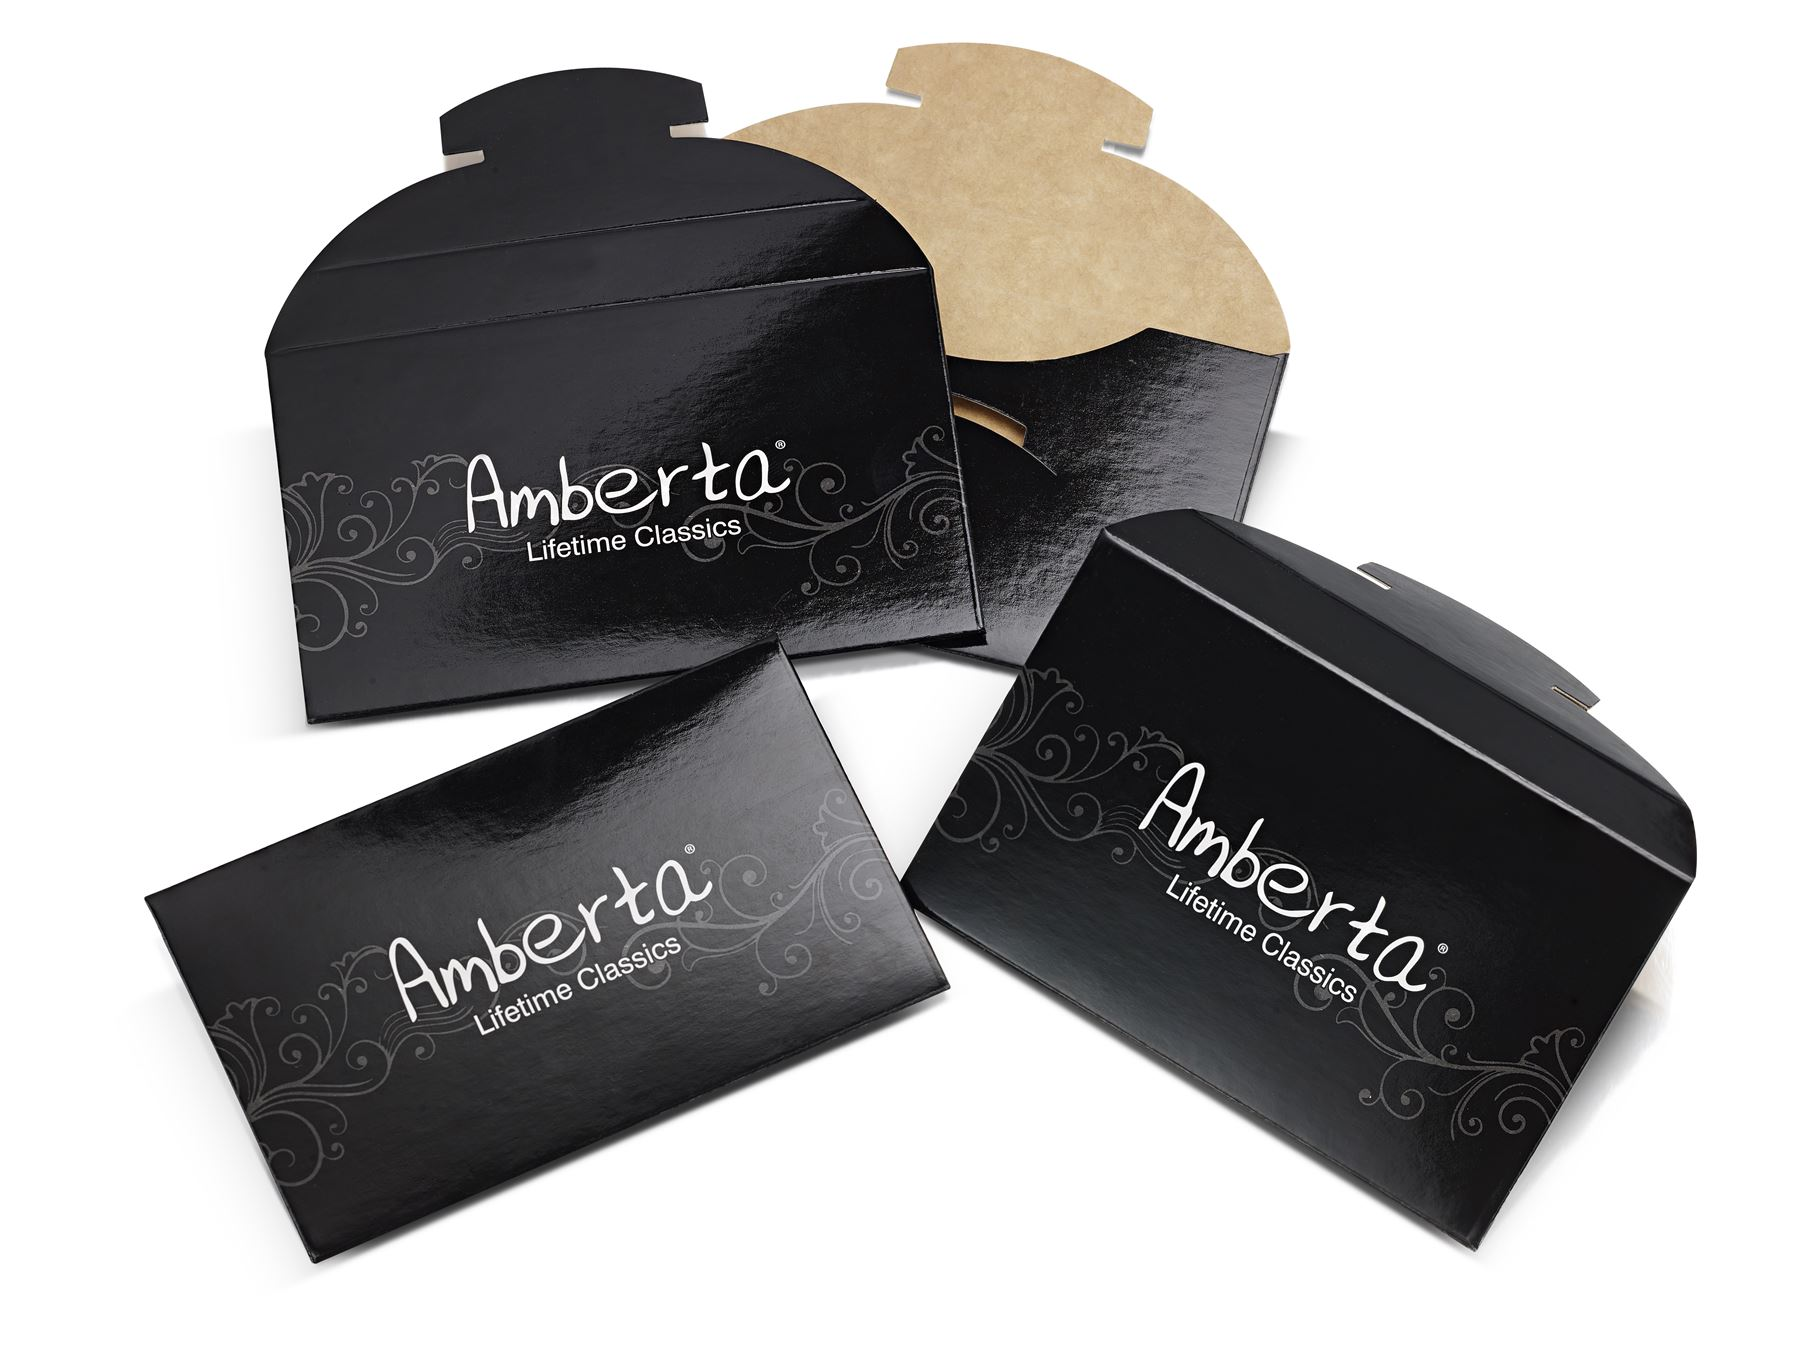 Amberta-Anillo-para-Pies-en-Plata-de-Ley-925-Anillo-Midi-Ajustable-para-Mujer miniatura 4